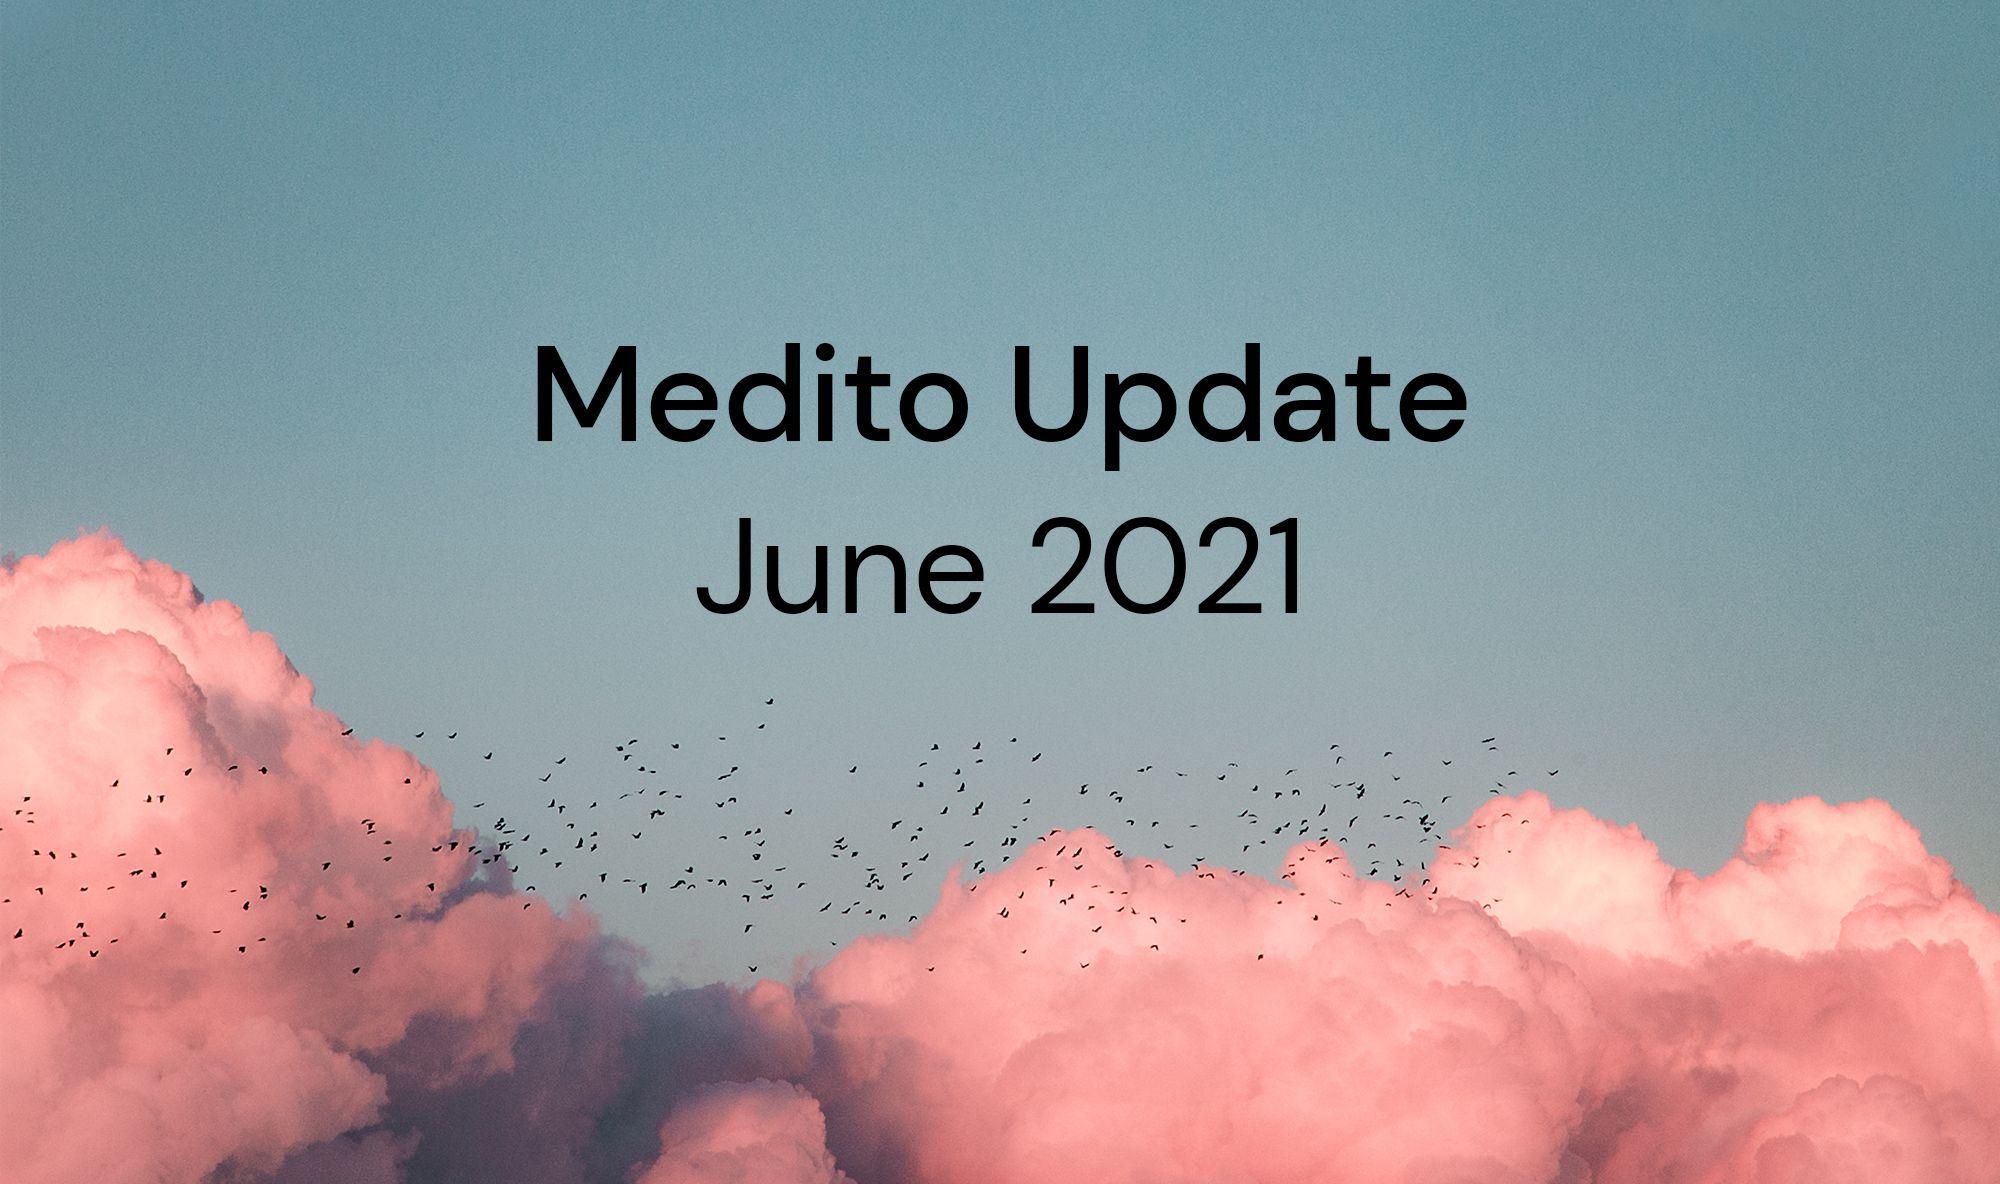 Medito Update - June 2021